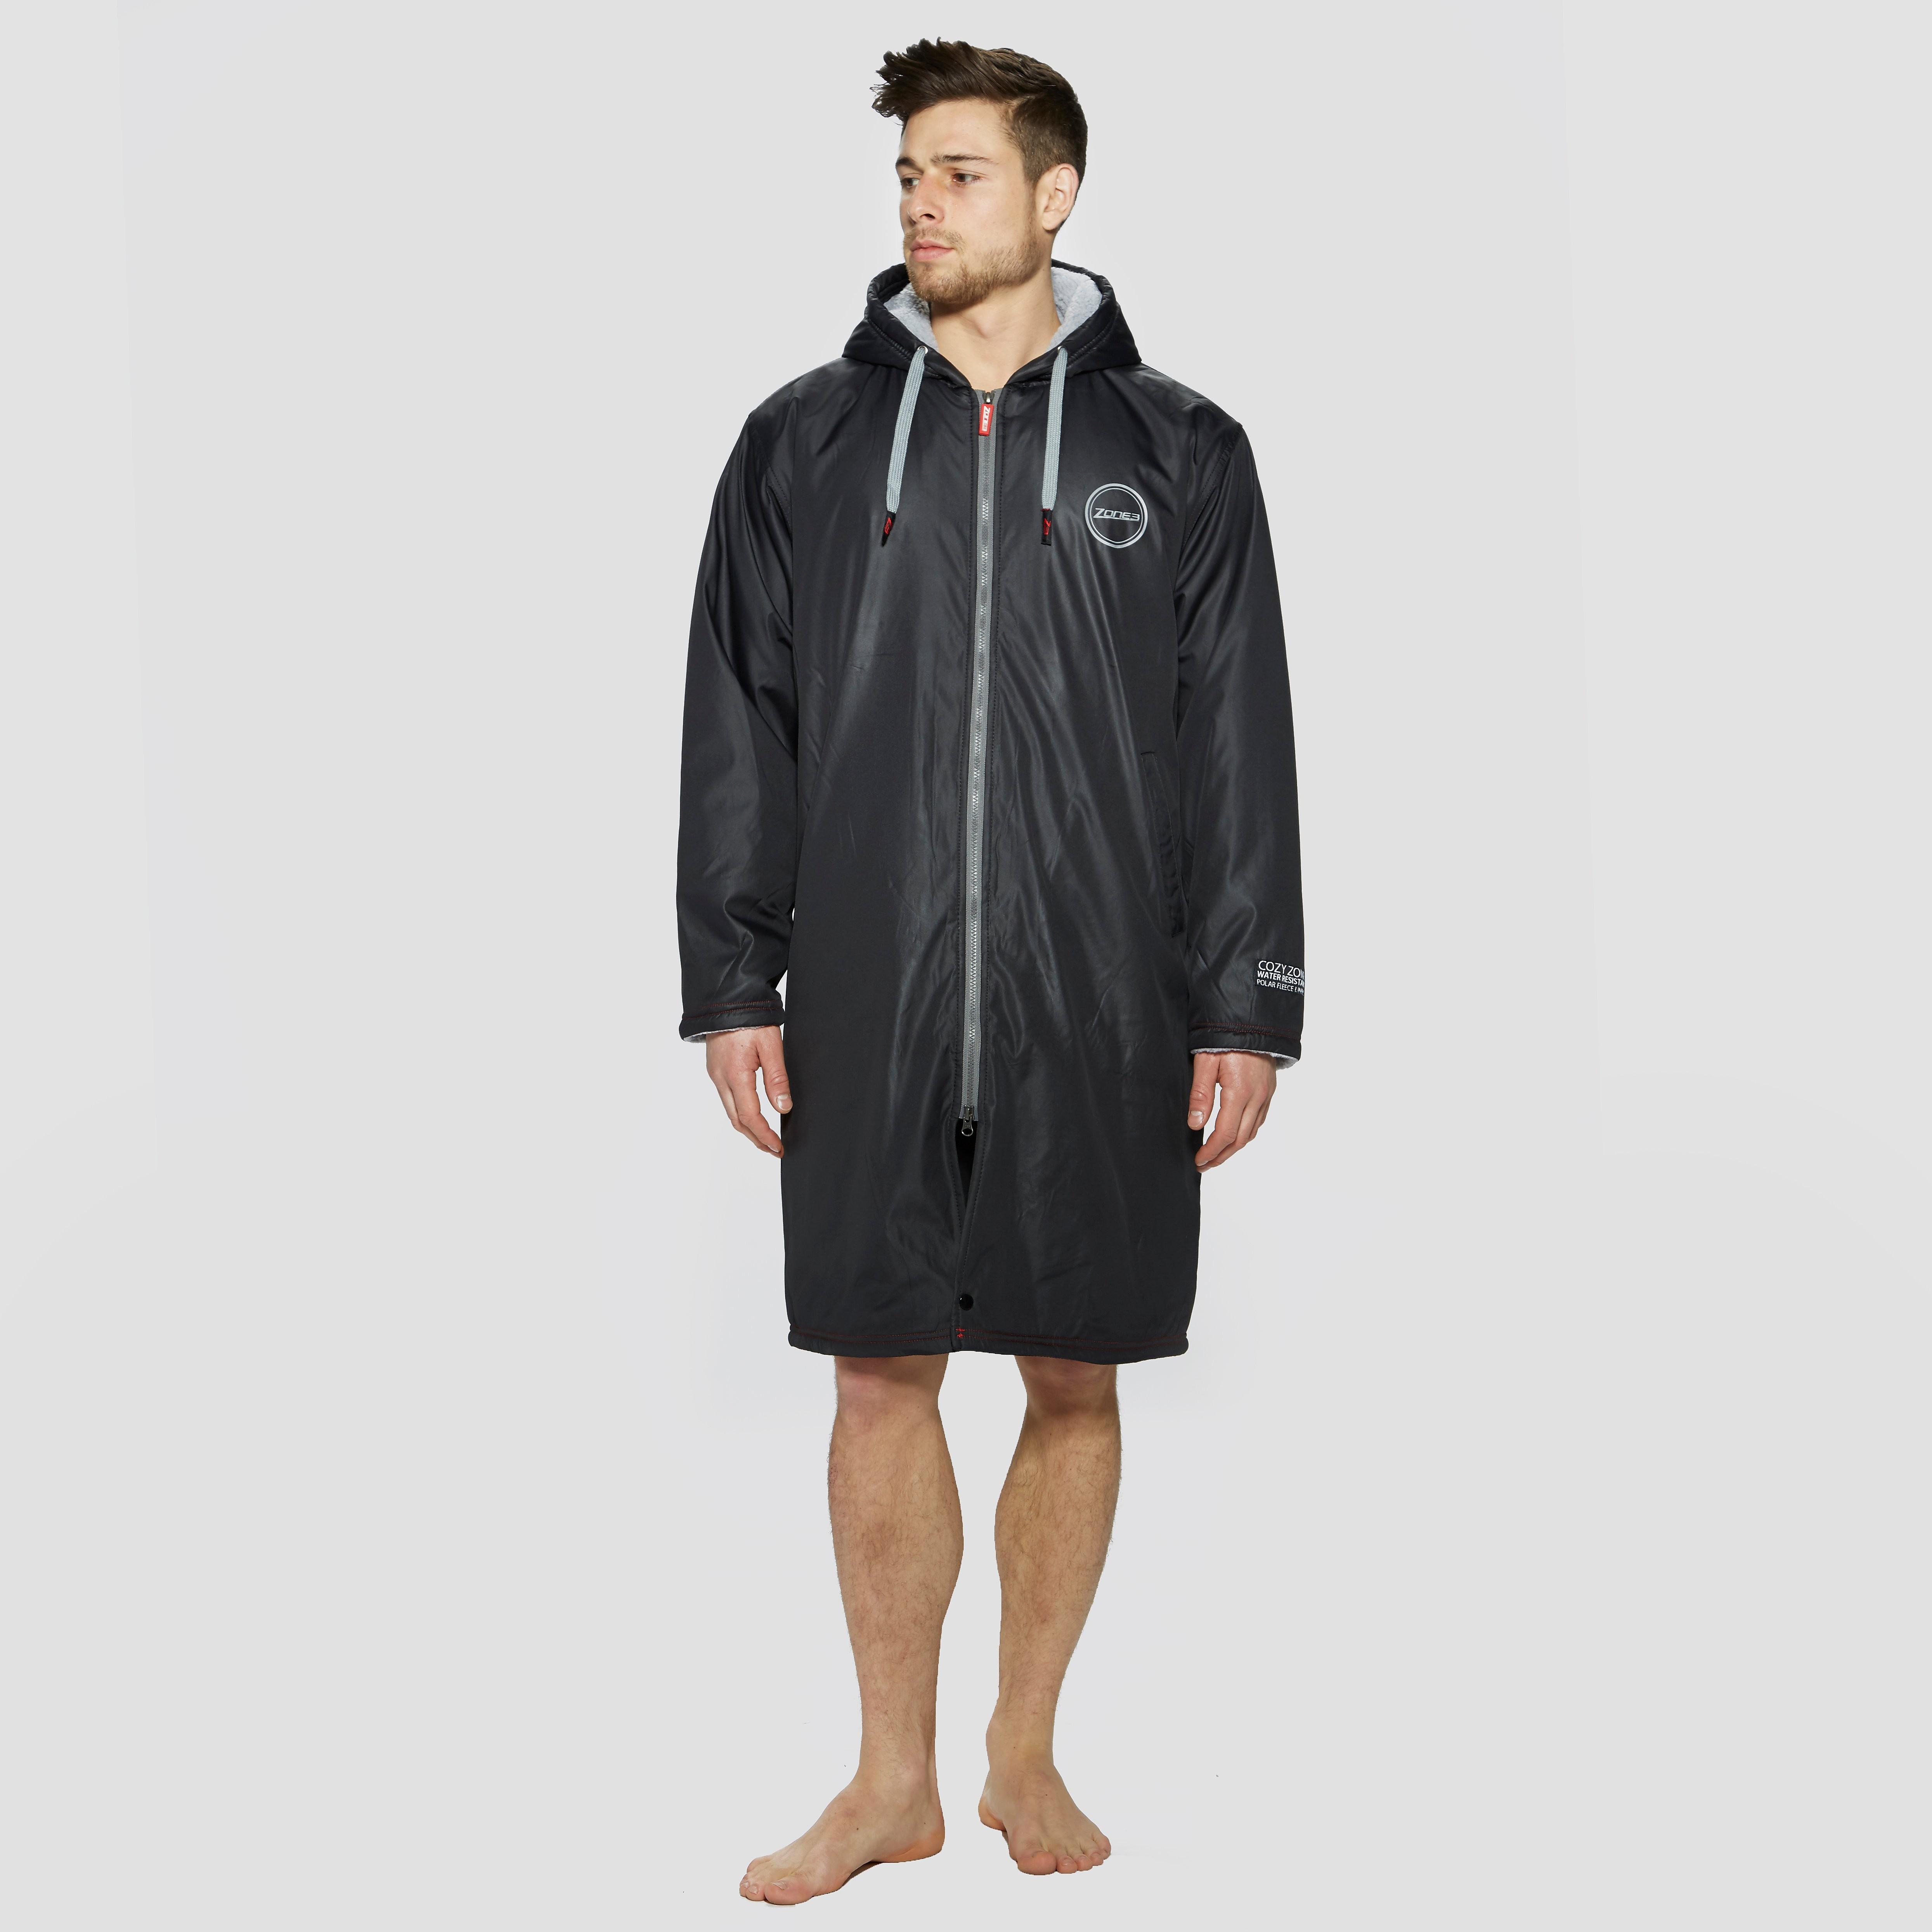 Zone 3 Polar Fleece Men's Jacket